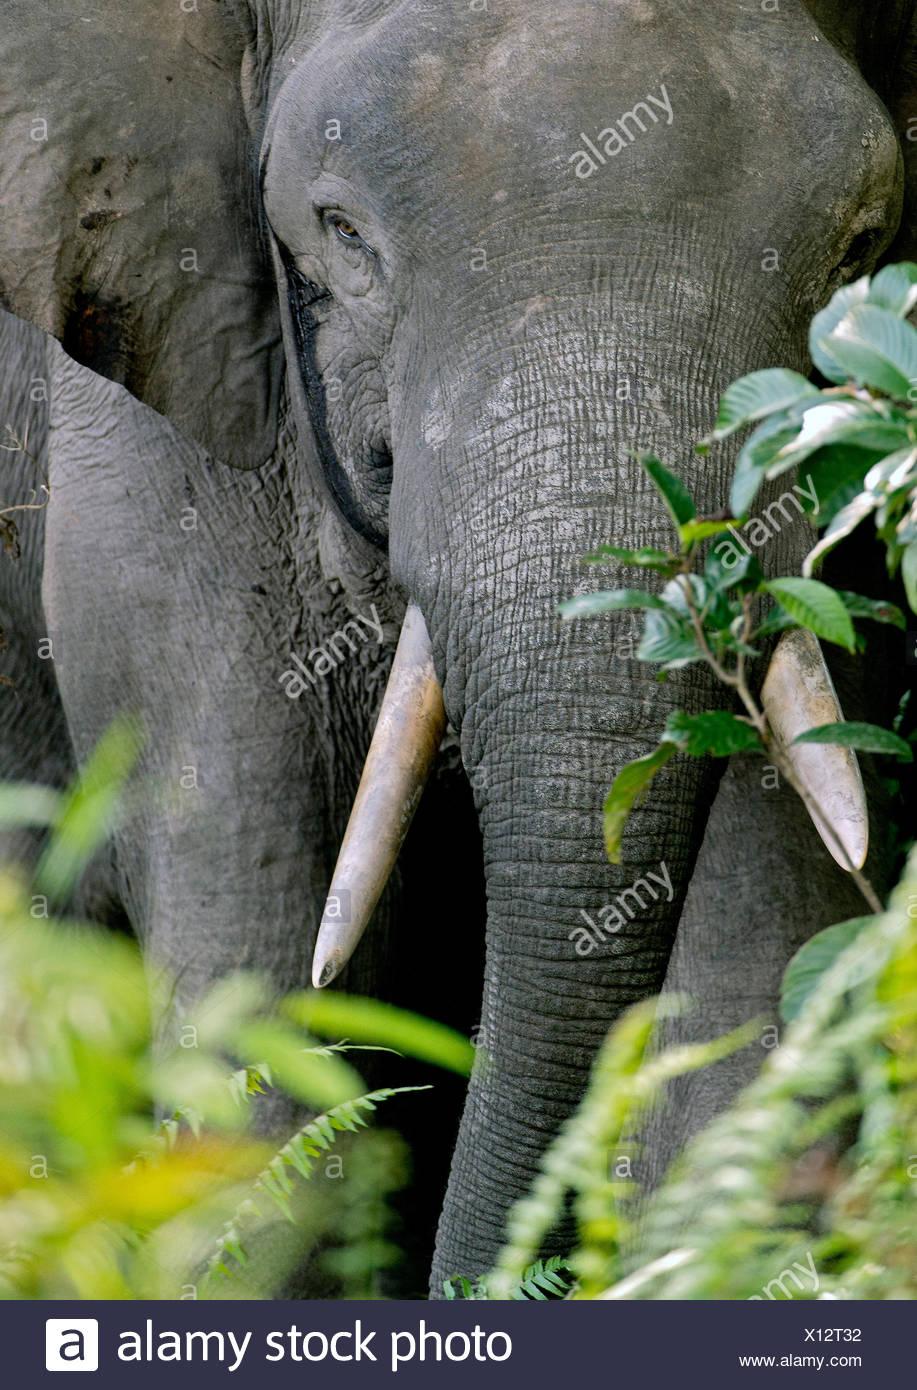 Bornes d'Éléphants nains borneensis (Elephas maximus), portrait, Malaisie, Bornéo, Sabah, rivière Kinabatangan Photo Stock